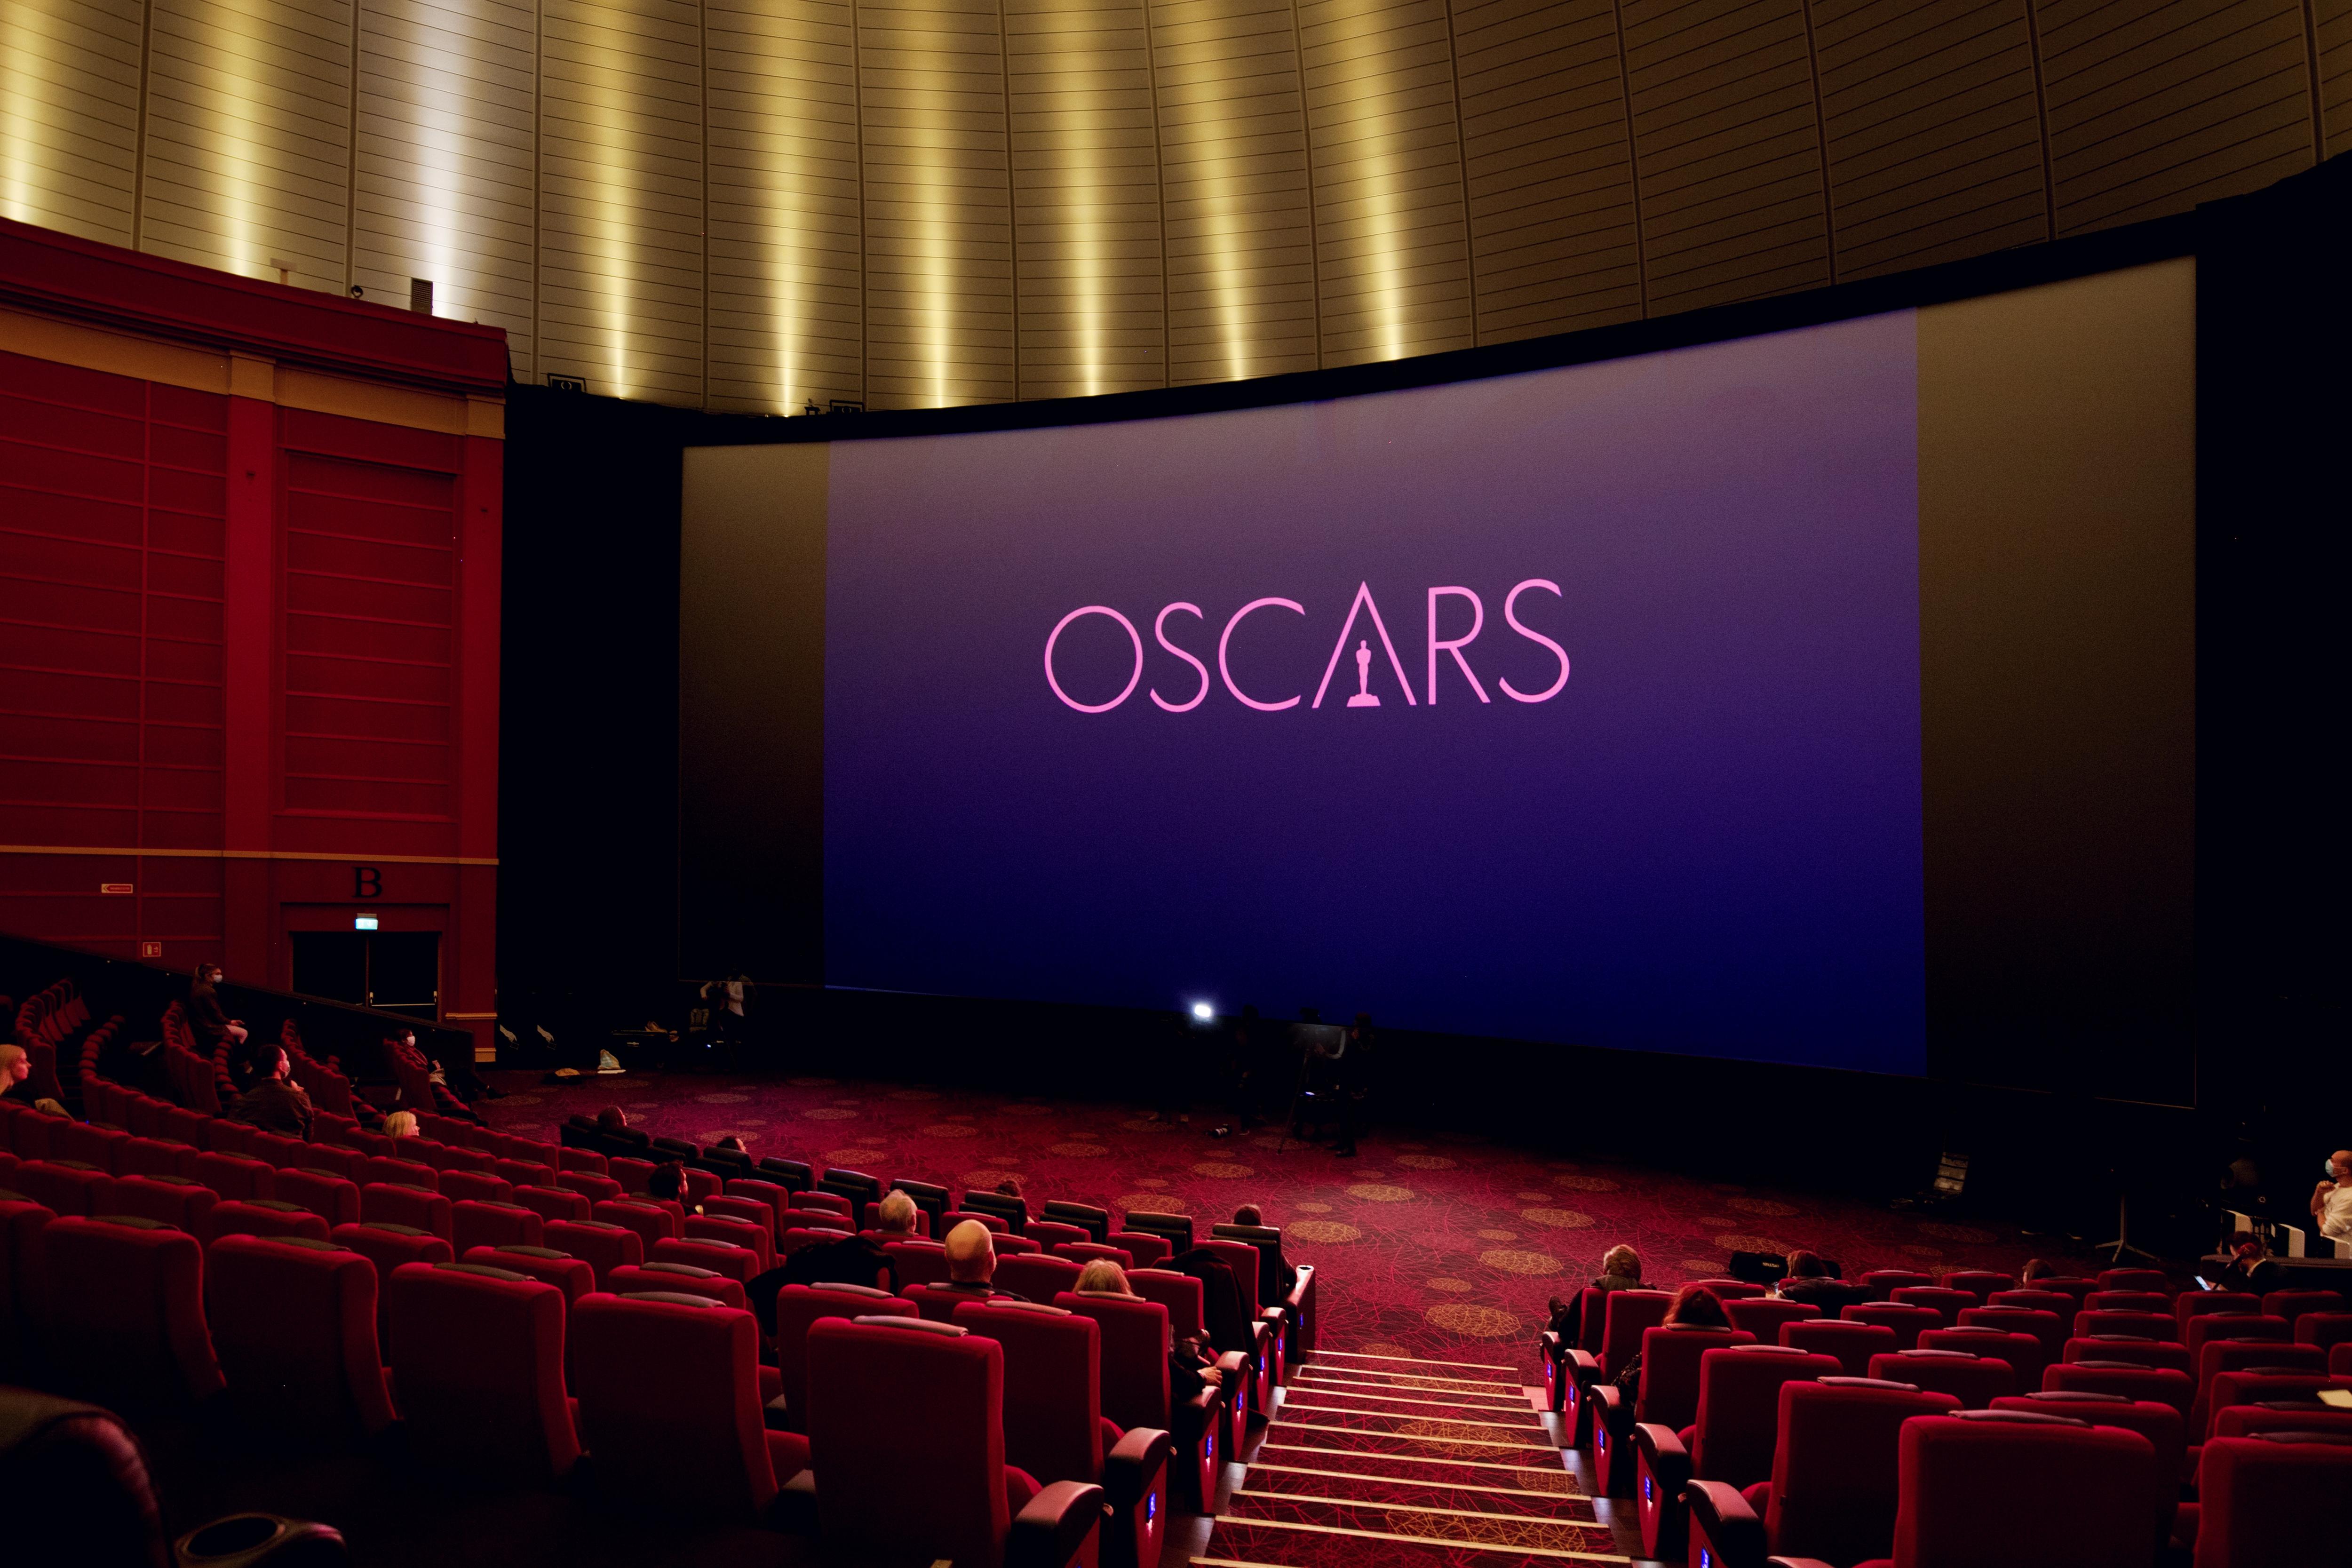 Oscars på letter